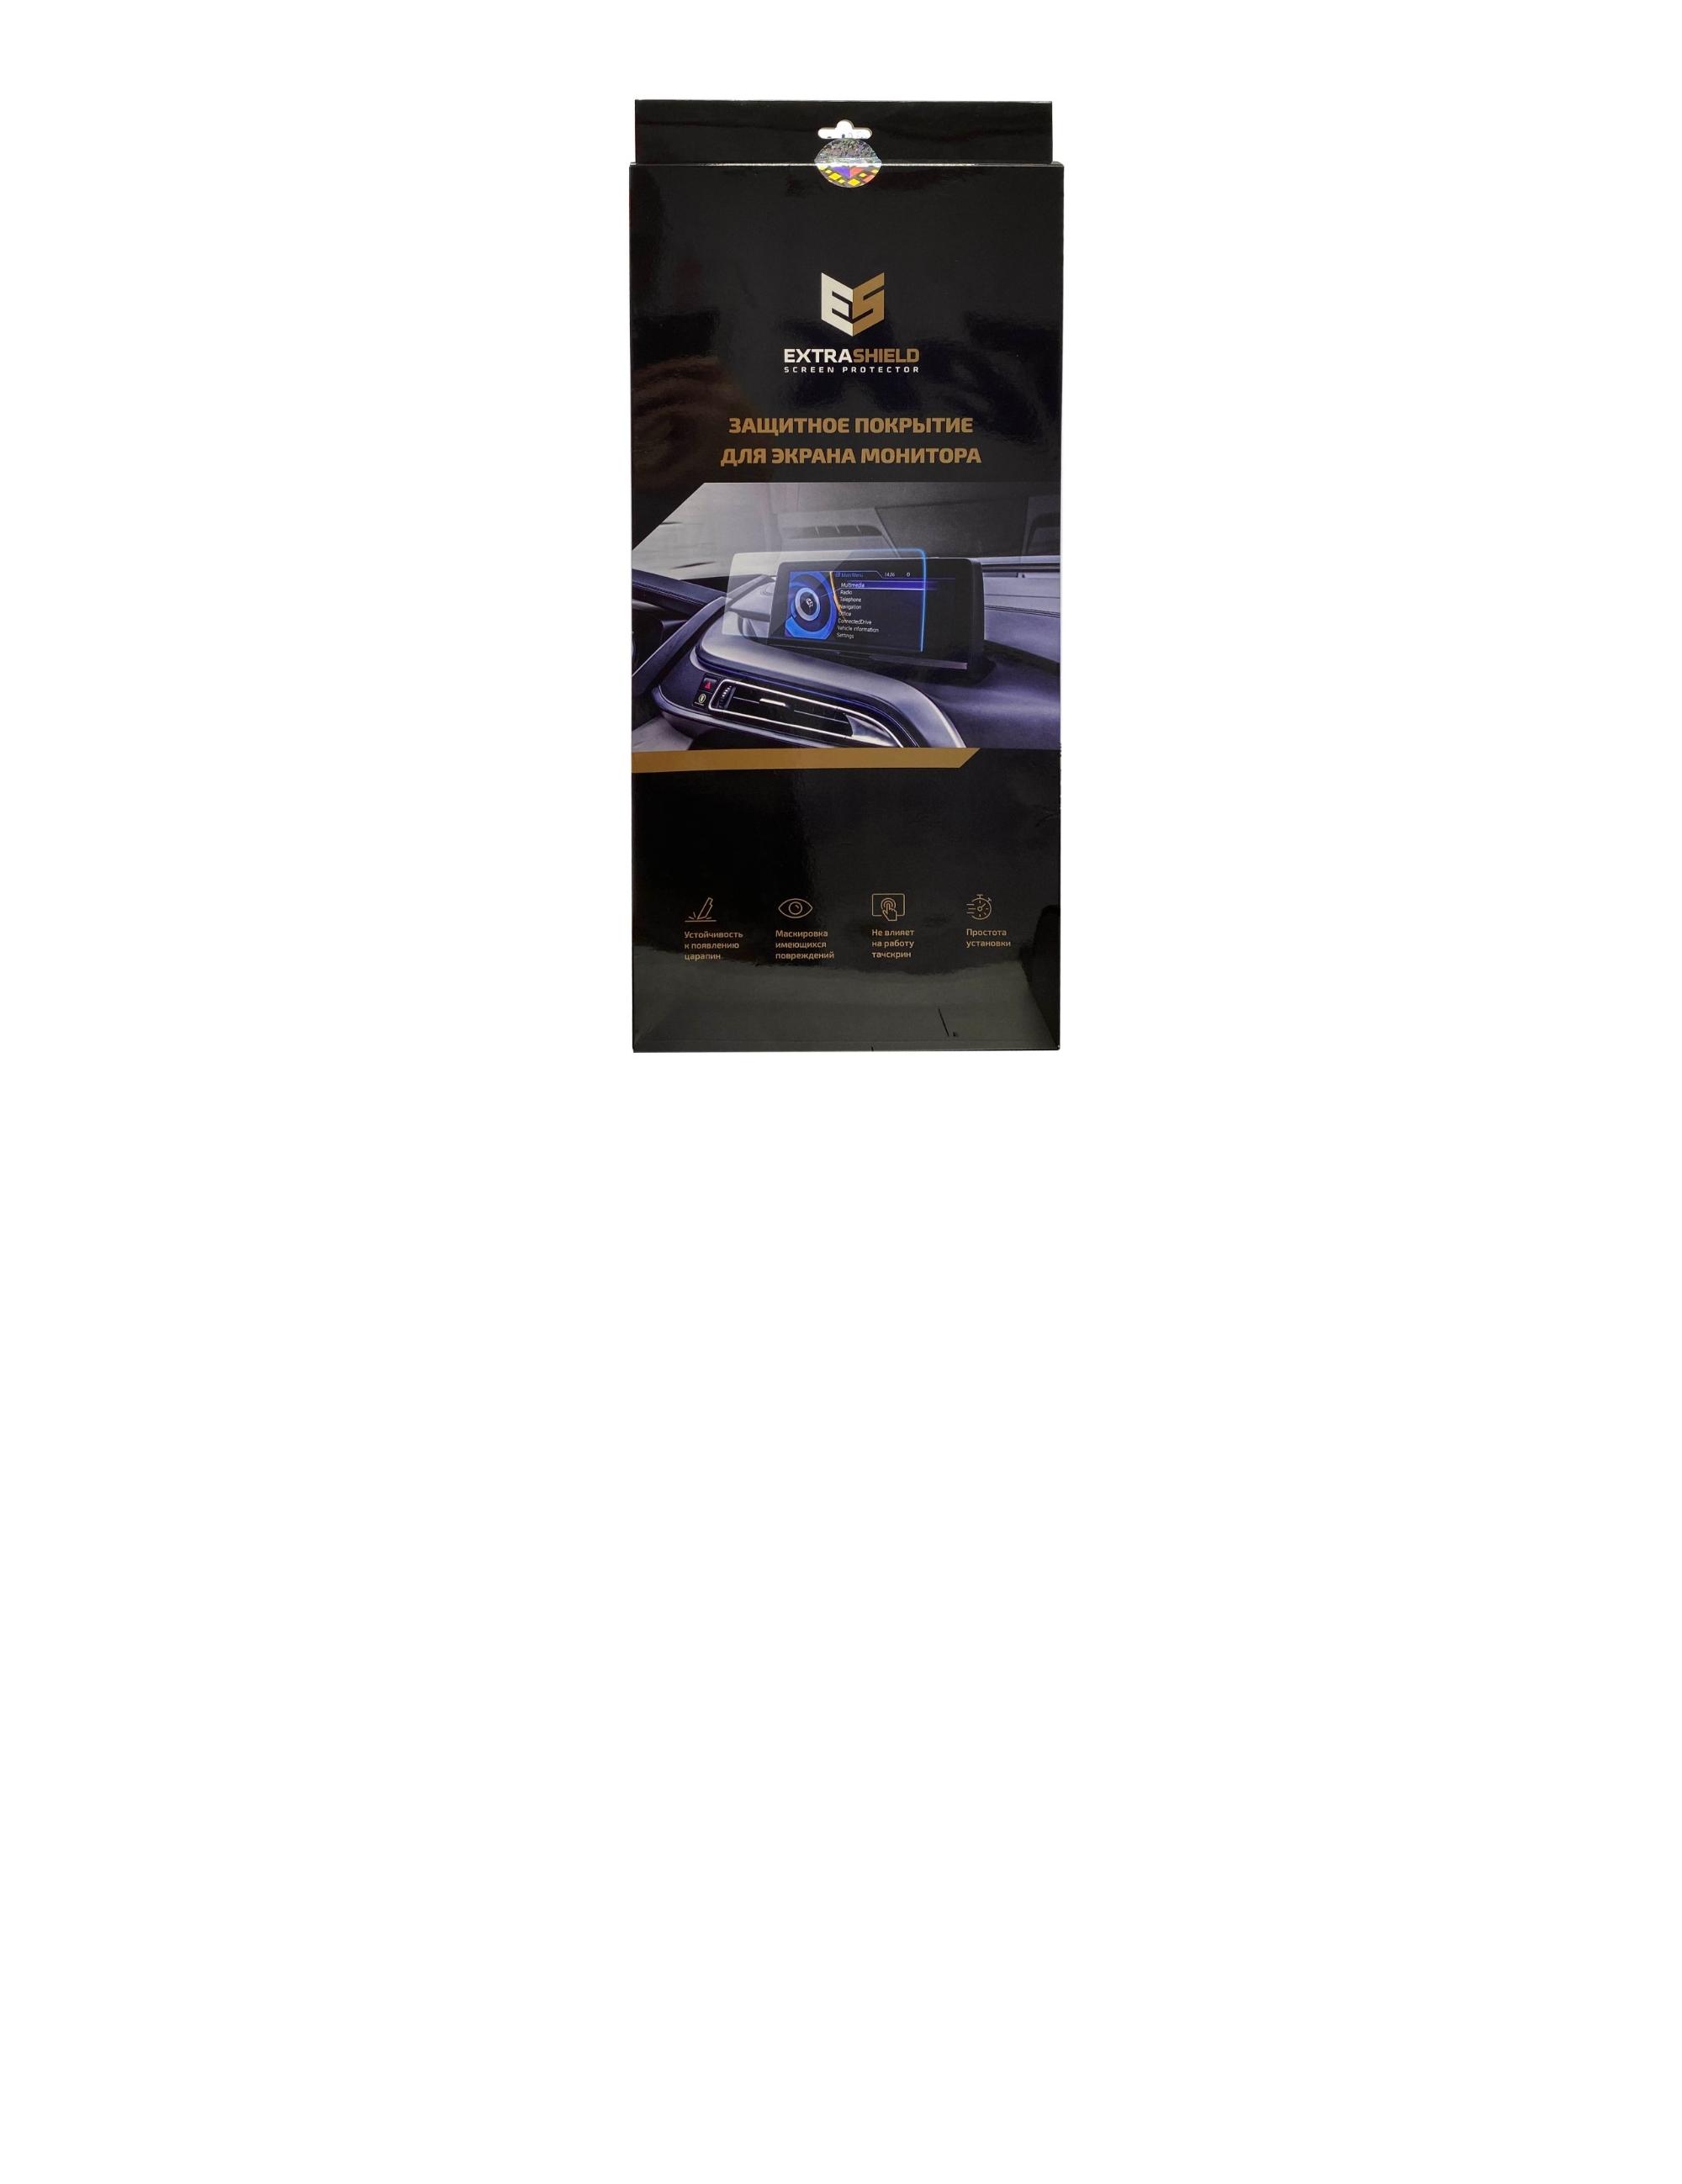 Volkswagen Terramont 2016 - 2020 мультимедиа Discover Media 8 Защитное стекло Глянец